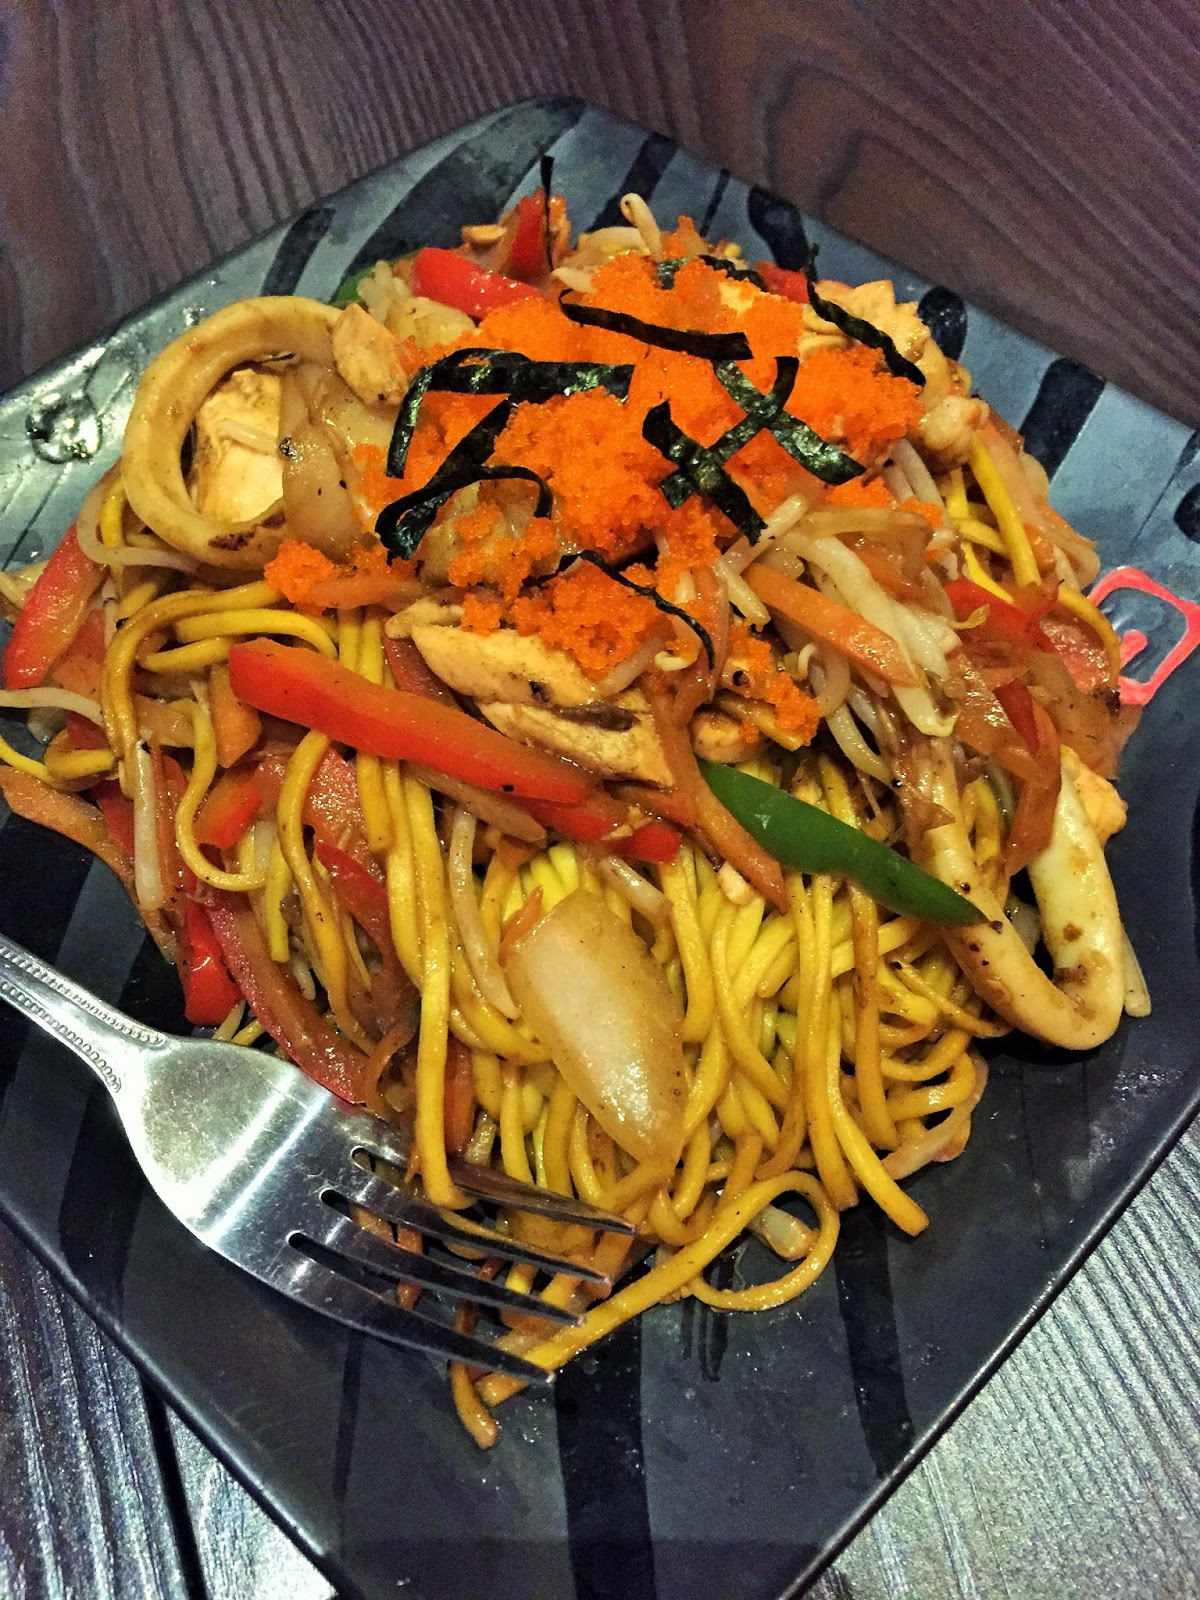 Sumo San fried noodles at Sumo San, Sheffield